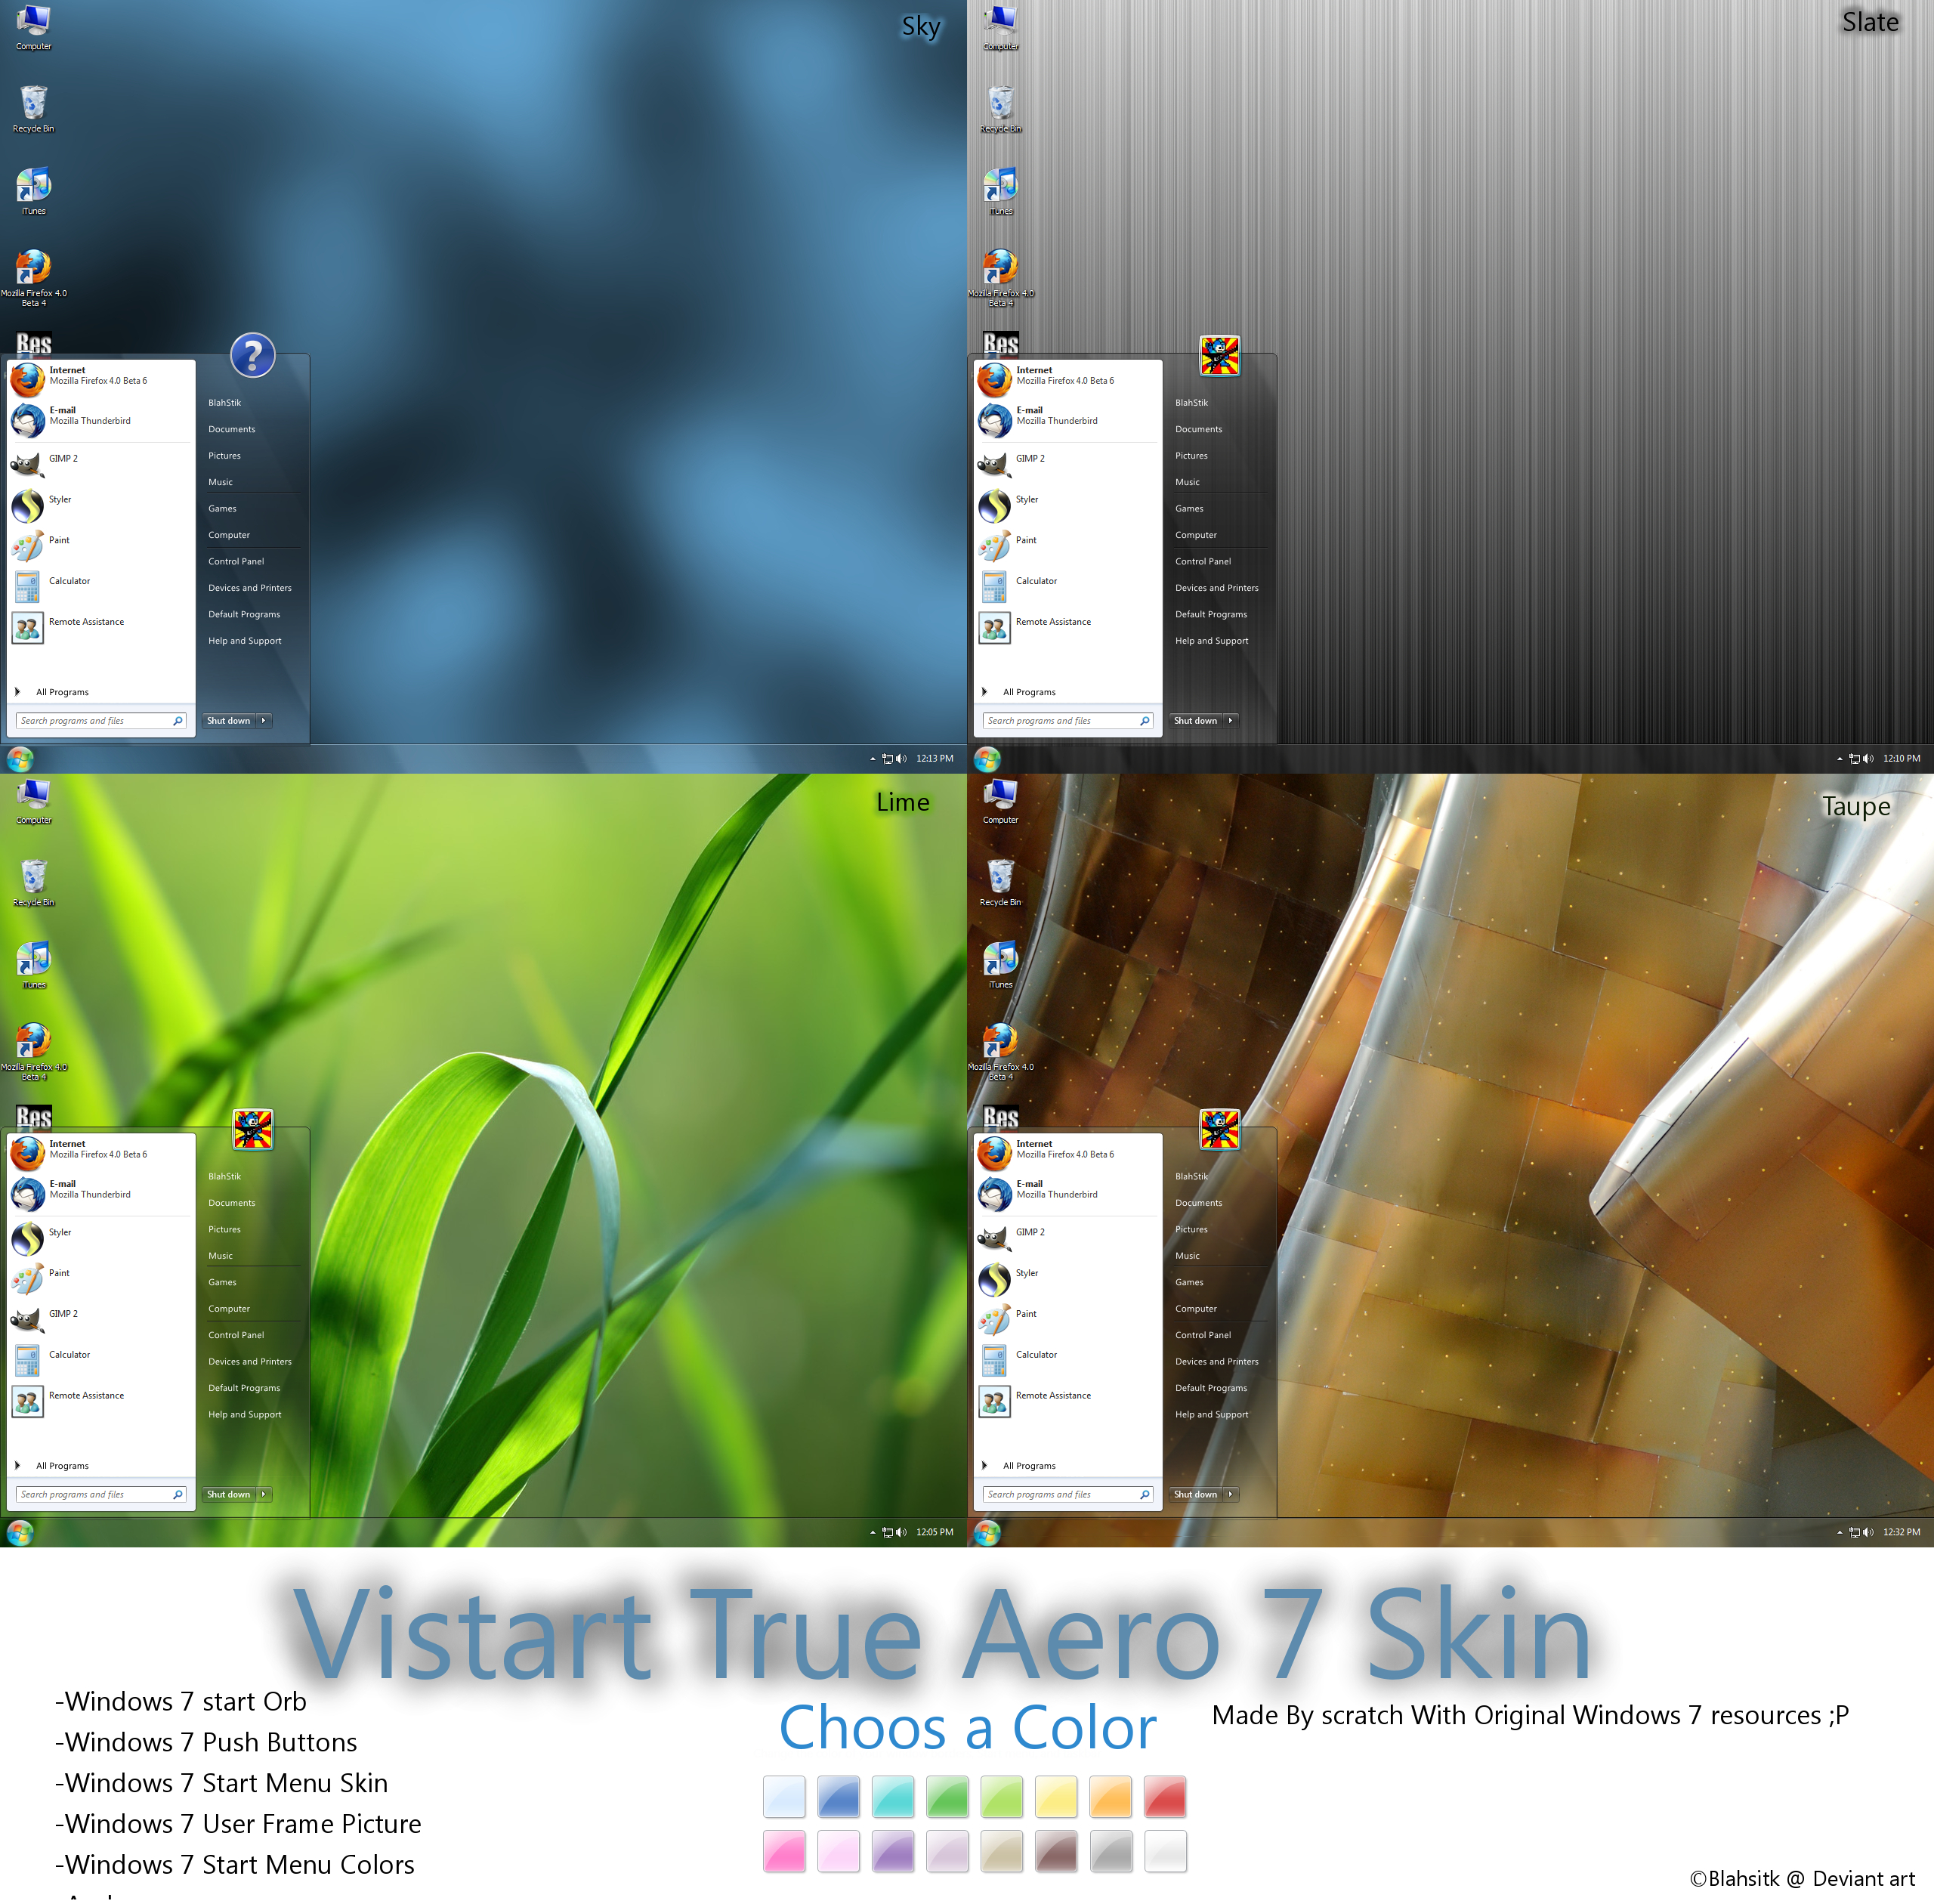 Vistart True Aero 7 skin